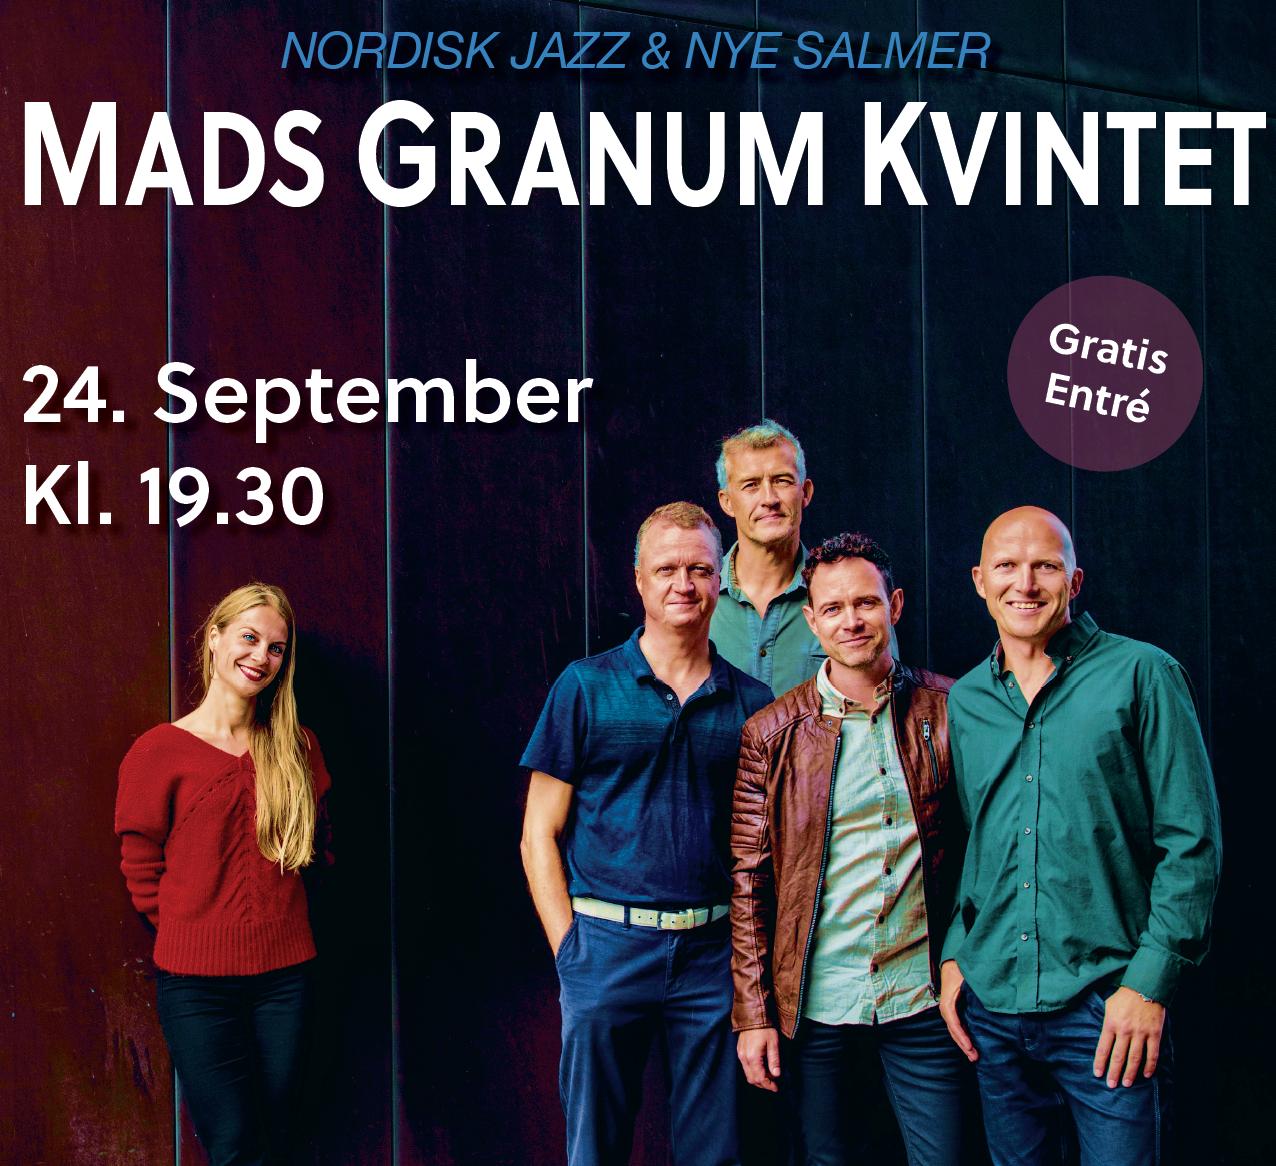 Koncert med Mads Granum Kvintet i Kirkeladen